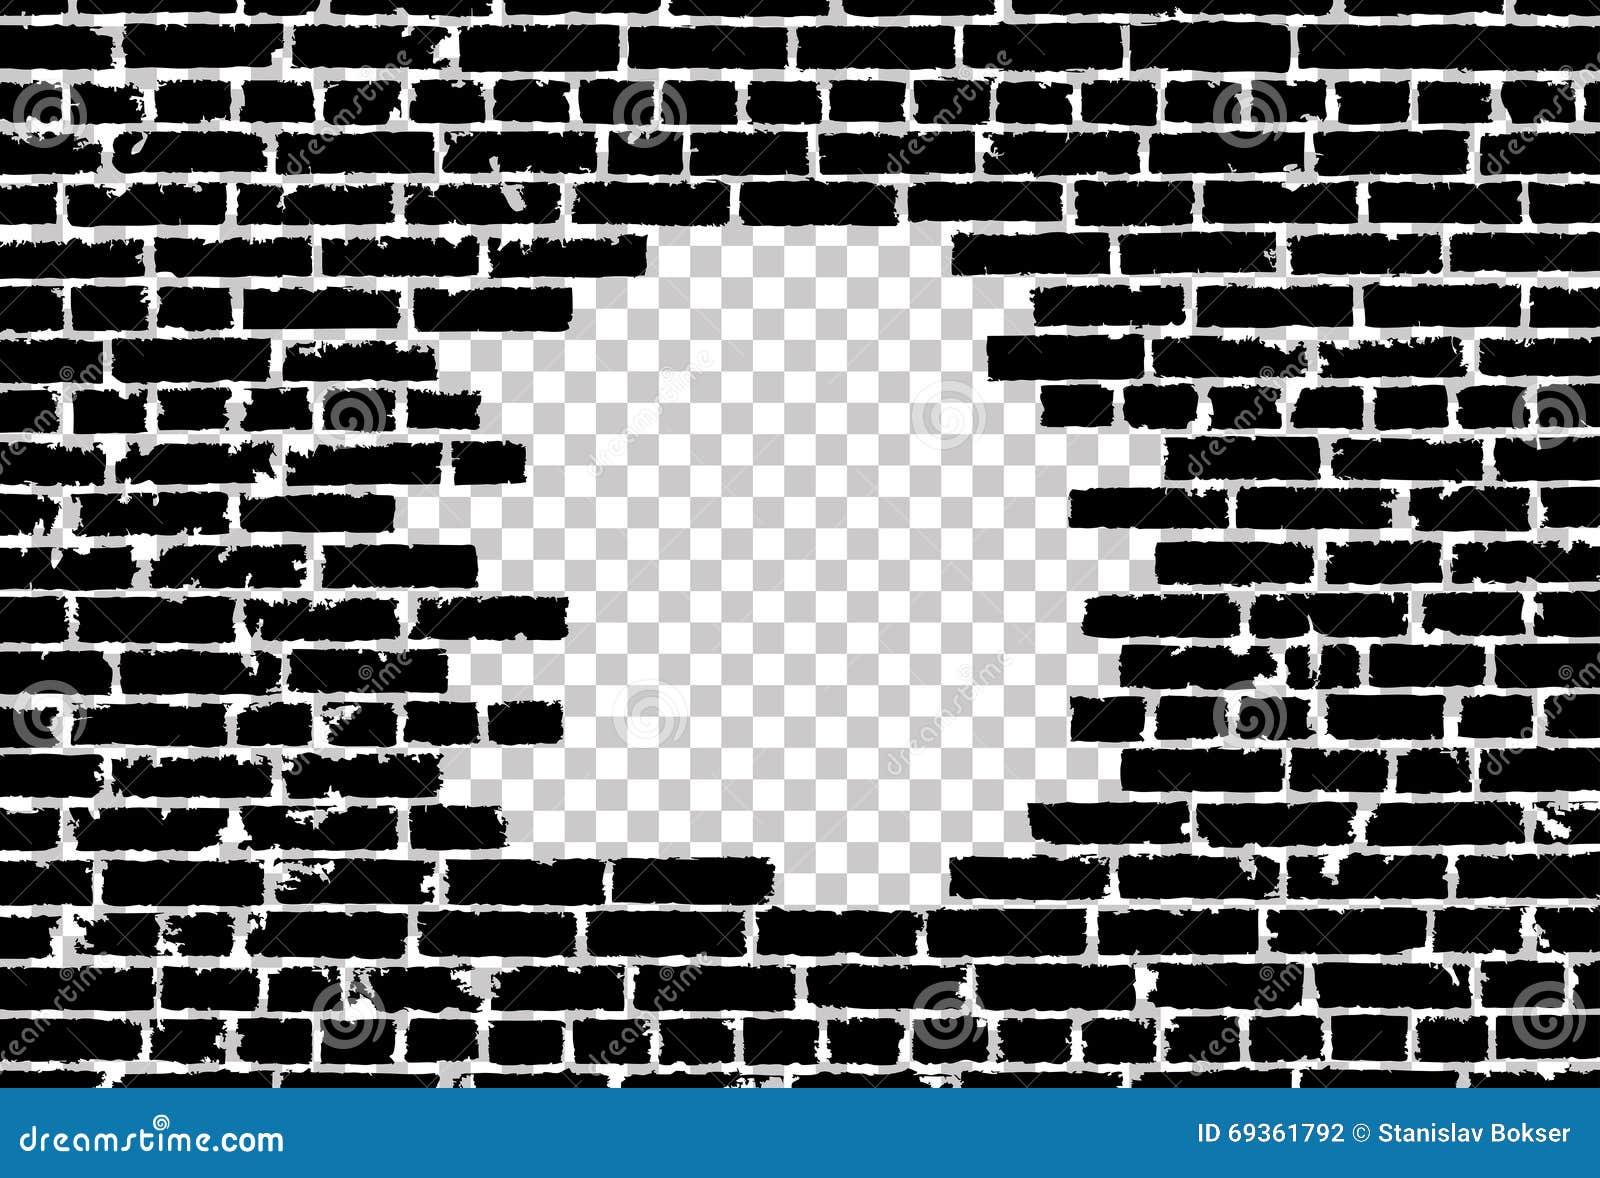 Broken Realistic Old Black Brick Wall Concept On Transparent